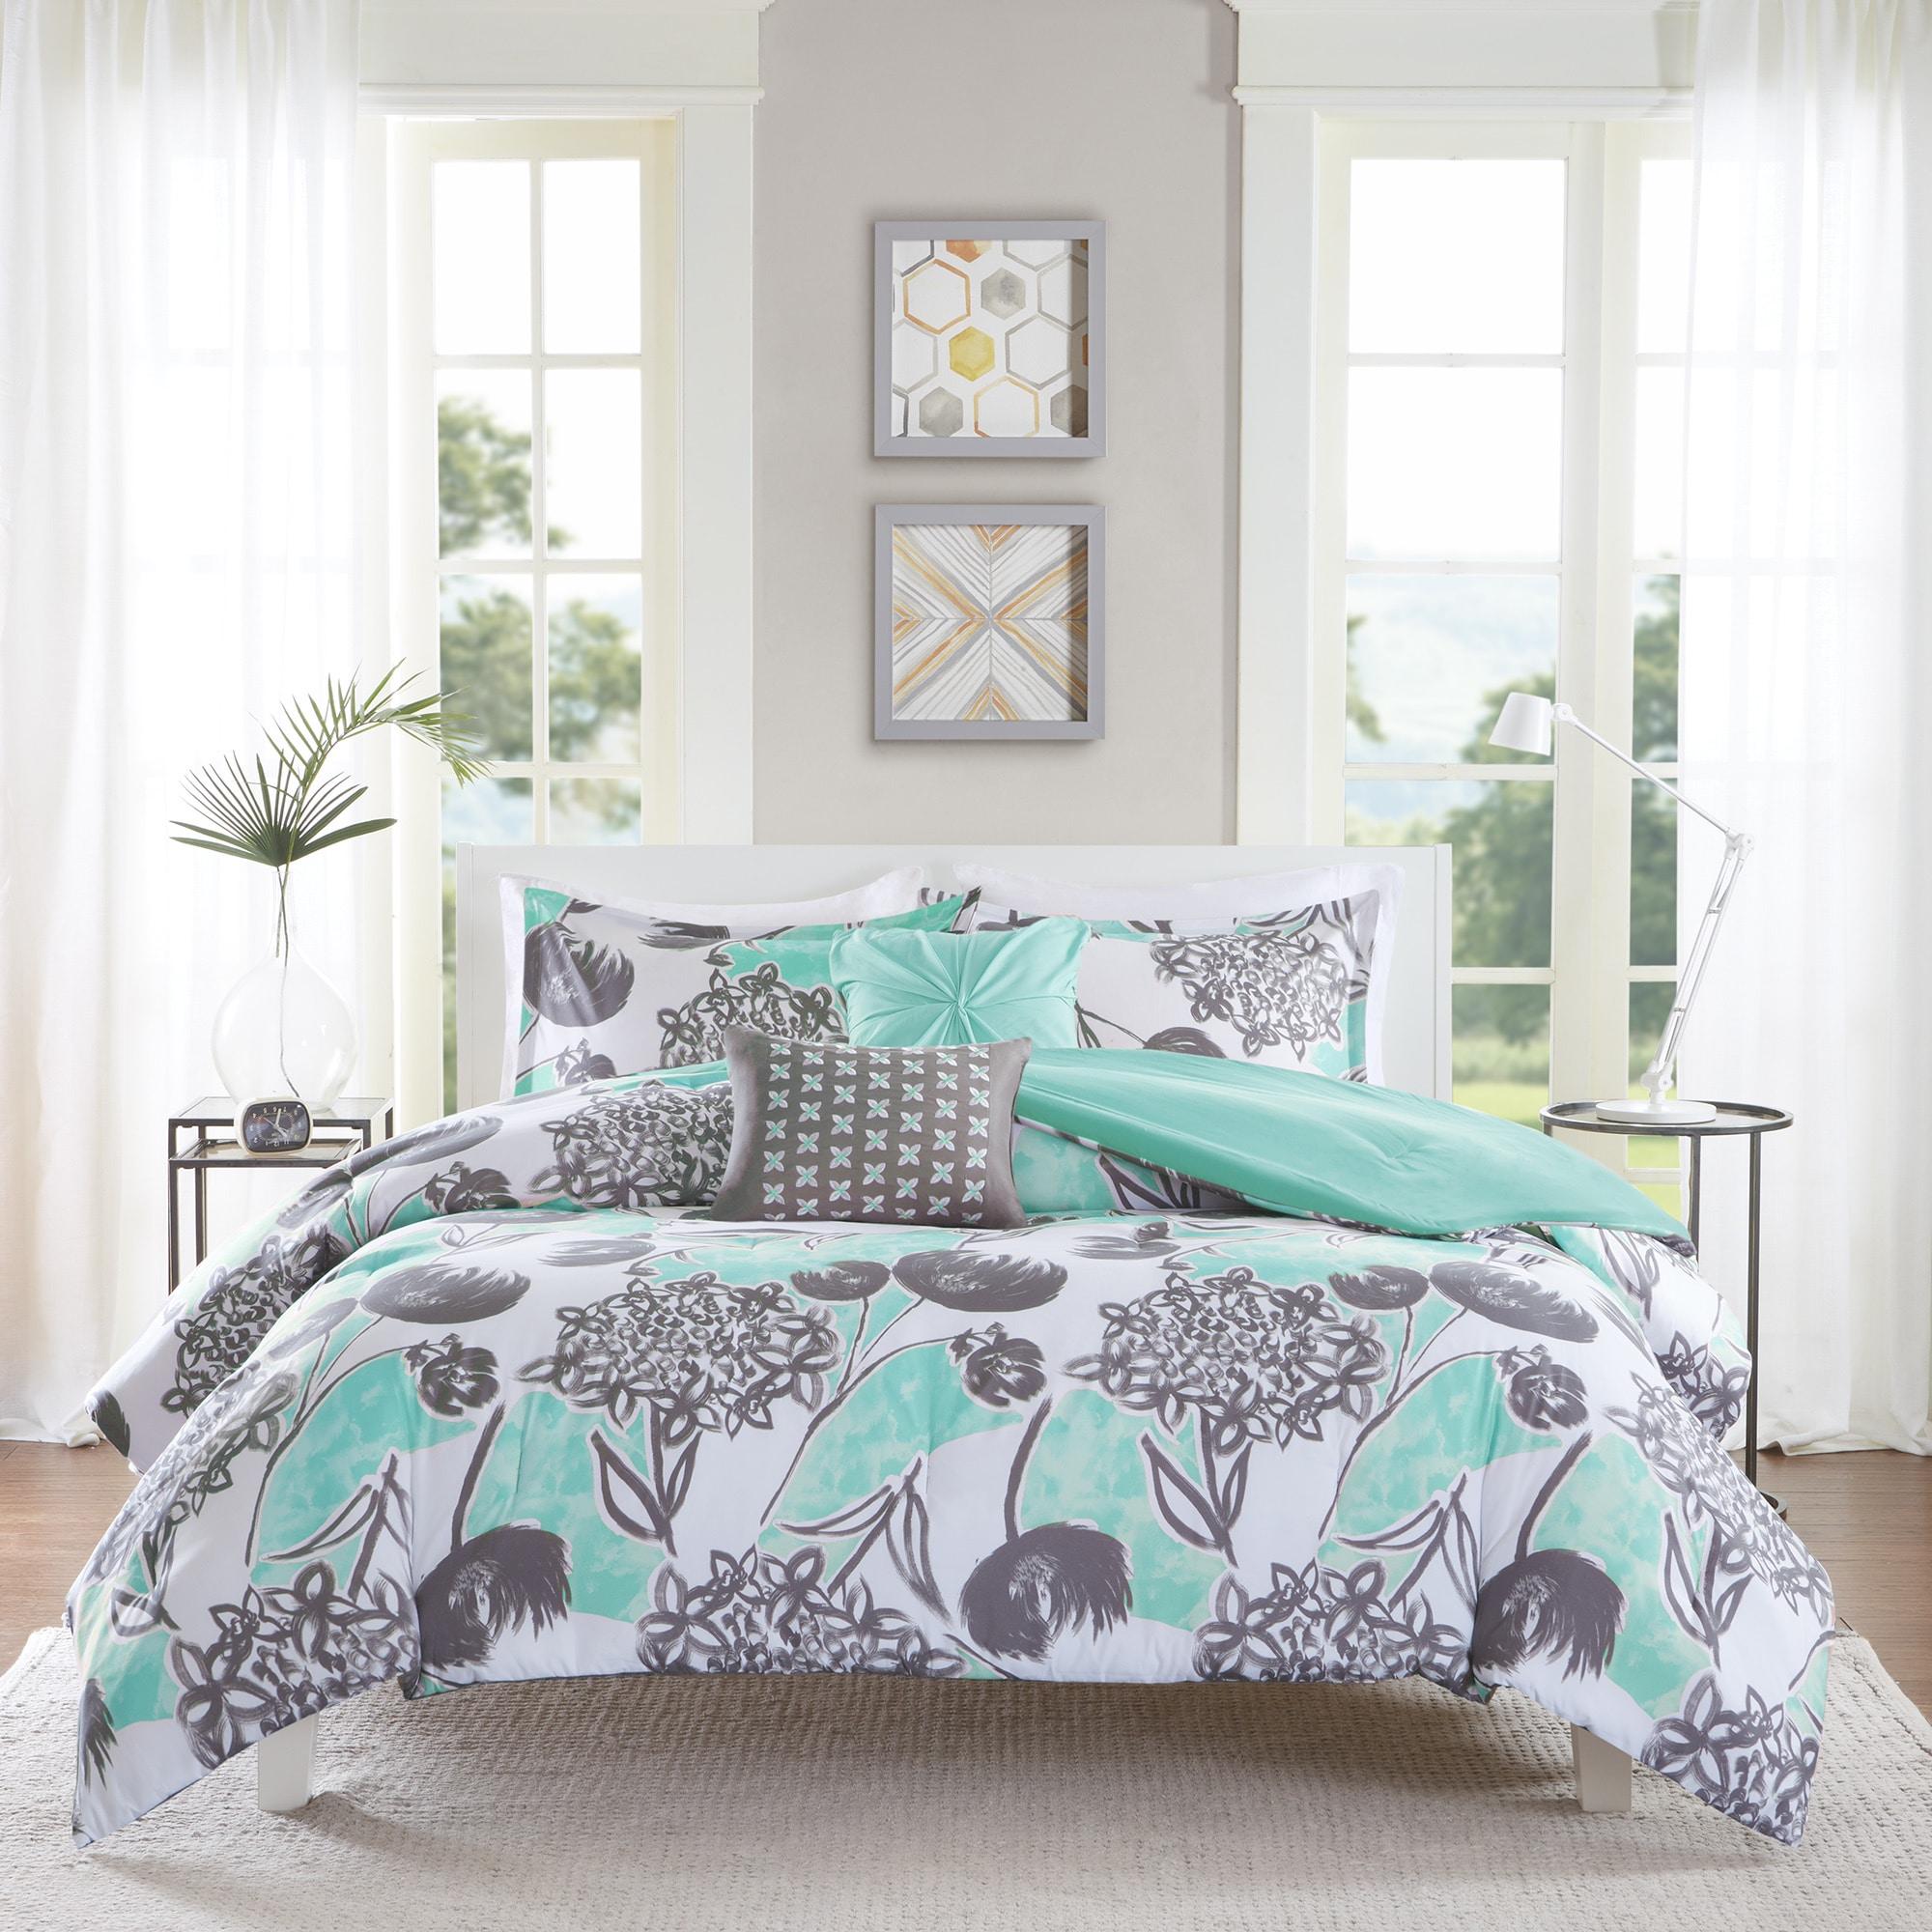 size set amazon dp comforter bedding bed com seasons adel grey design light intelligent queen aqua full